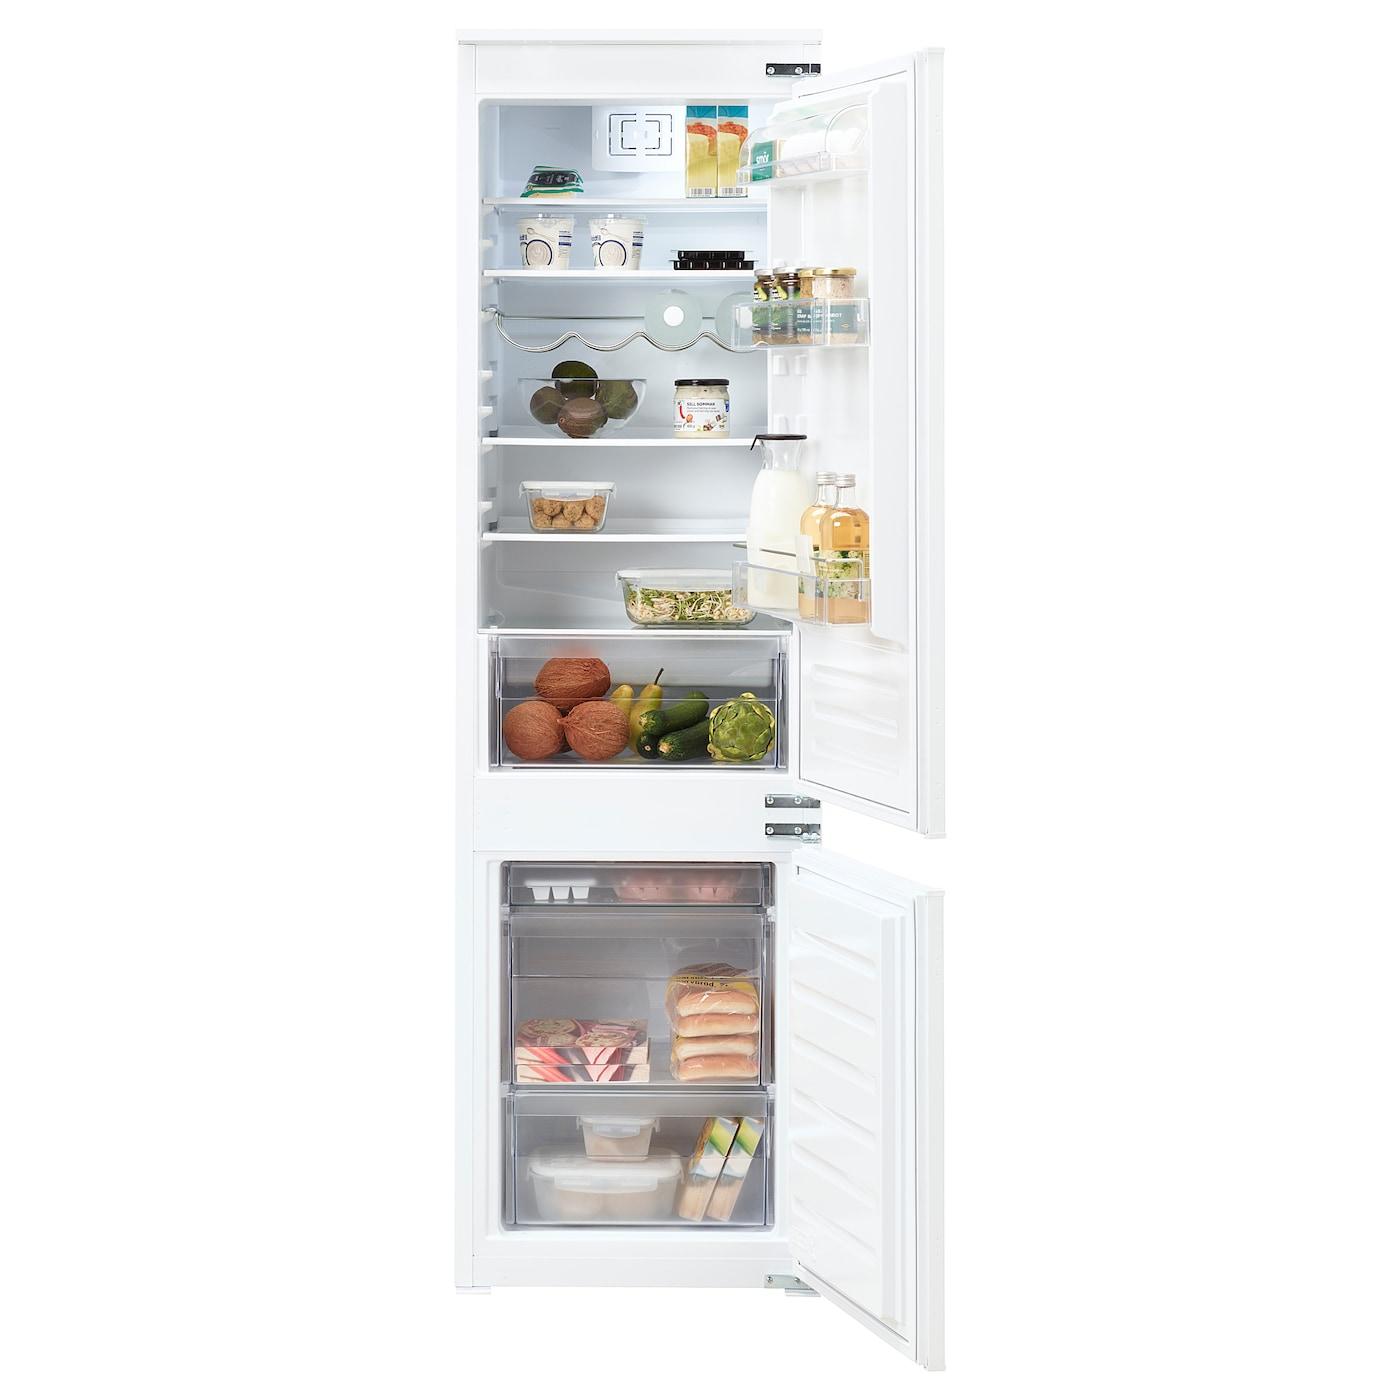 tinad integrated fridge freezer a white 210 79 l ikea. Black Bedroom Furniture Sets. Home Design Ideas